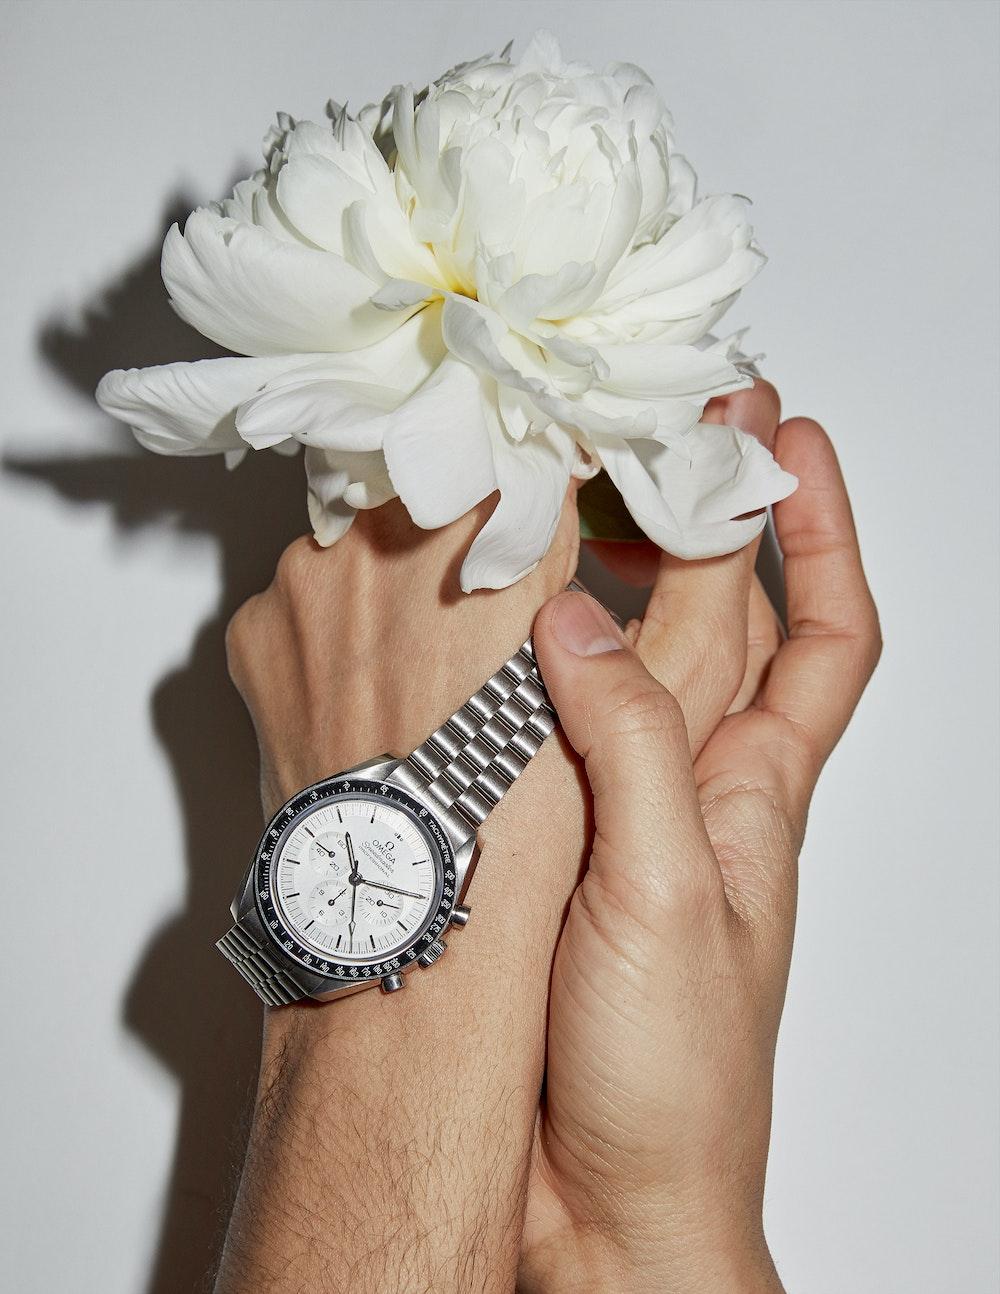 1618593778 watches5 jpg?fit=max&fm=jpg&w=1000.